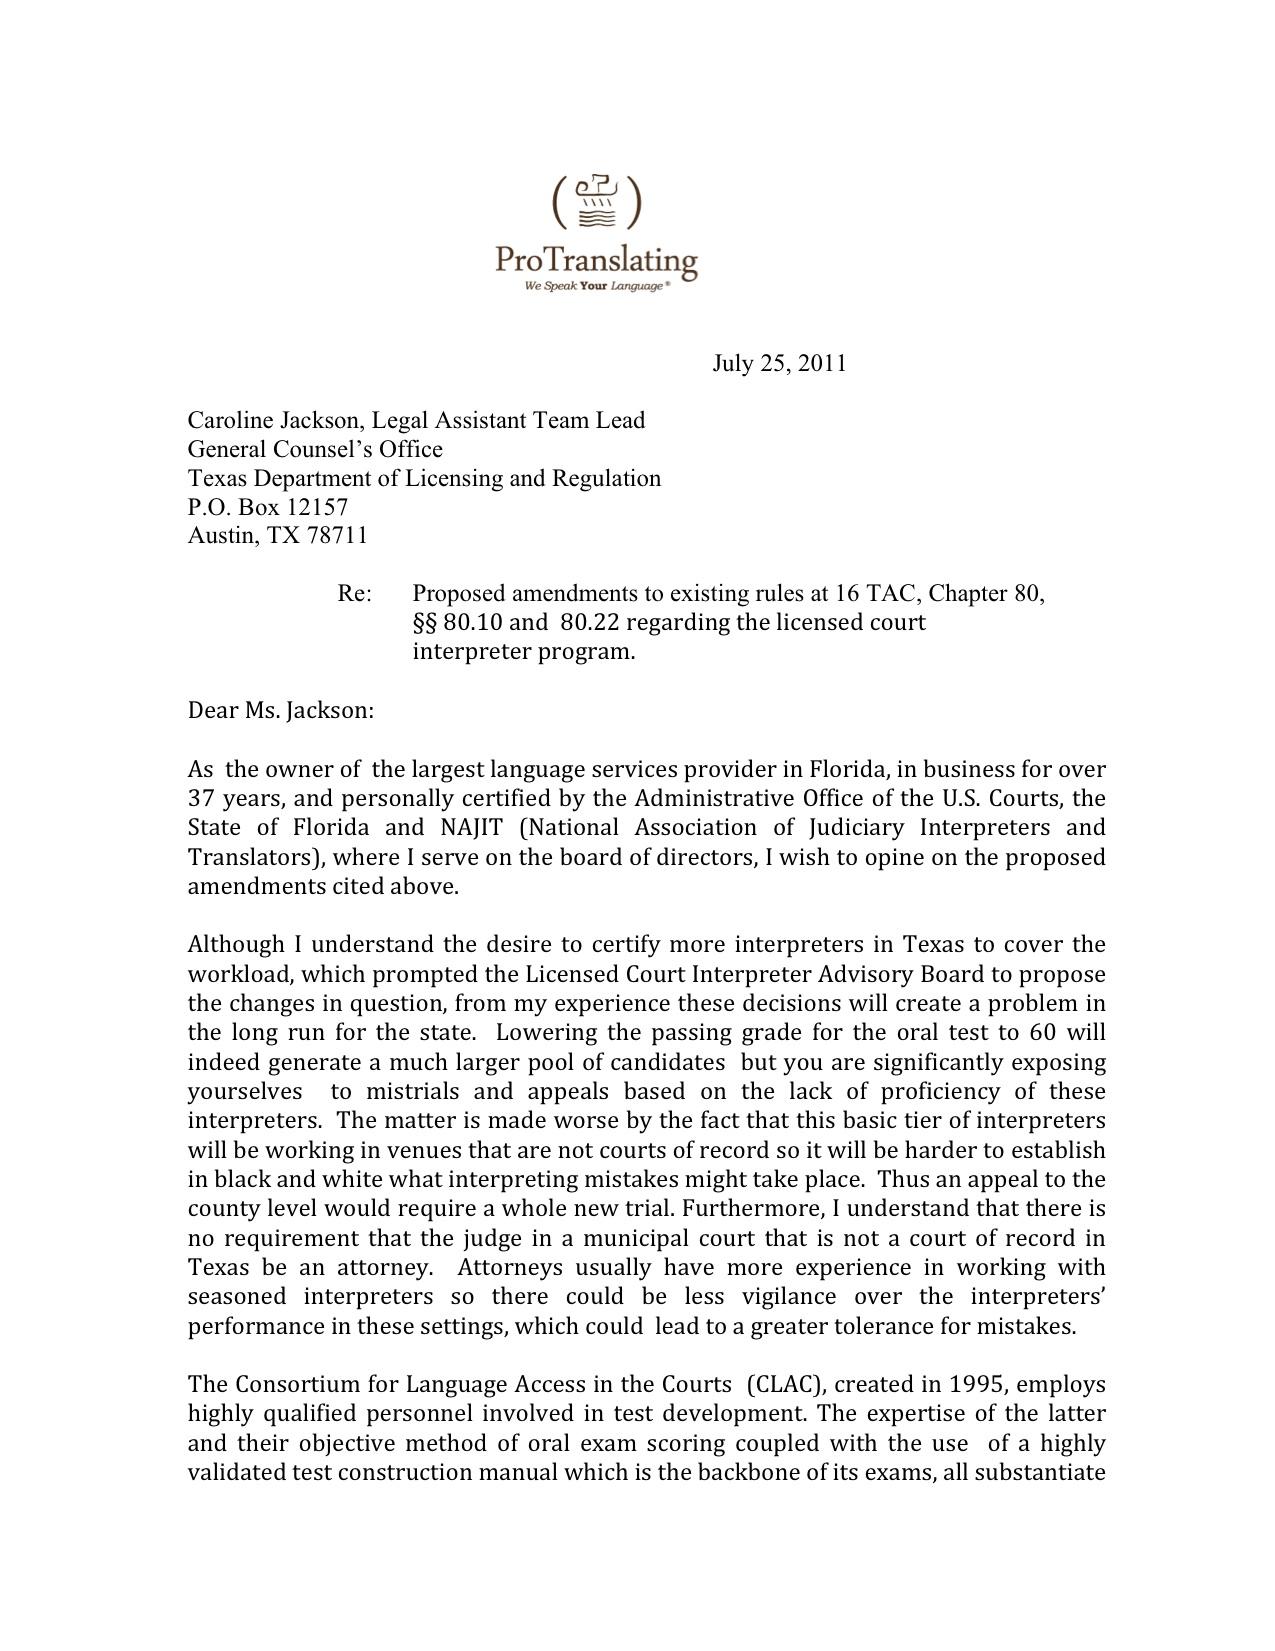 Court Interpreter Cover Letter